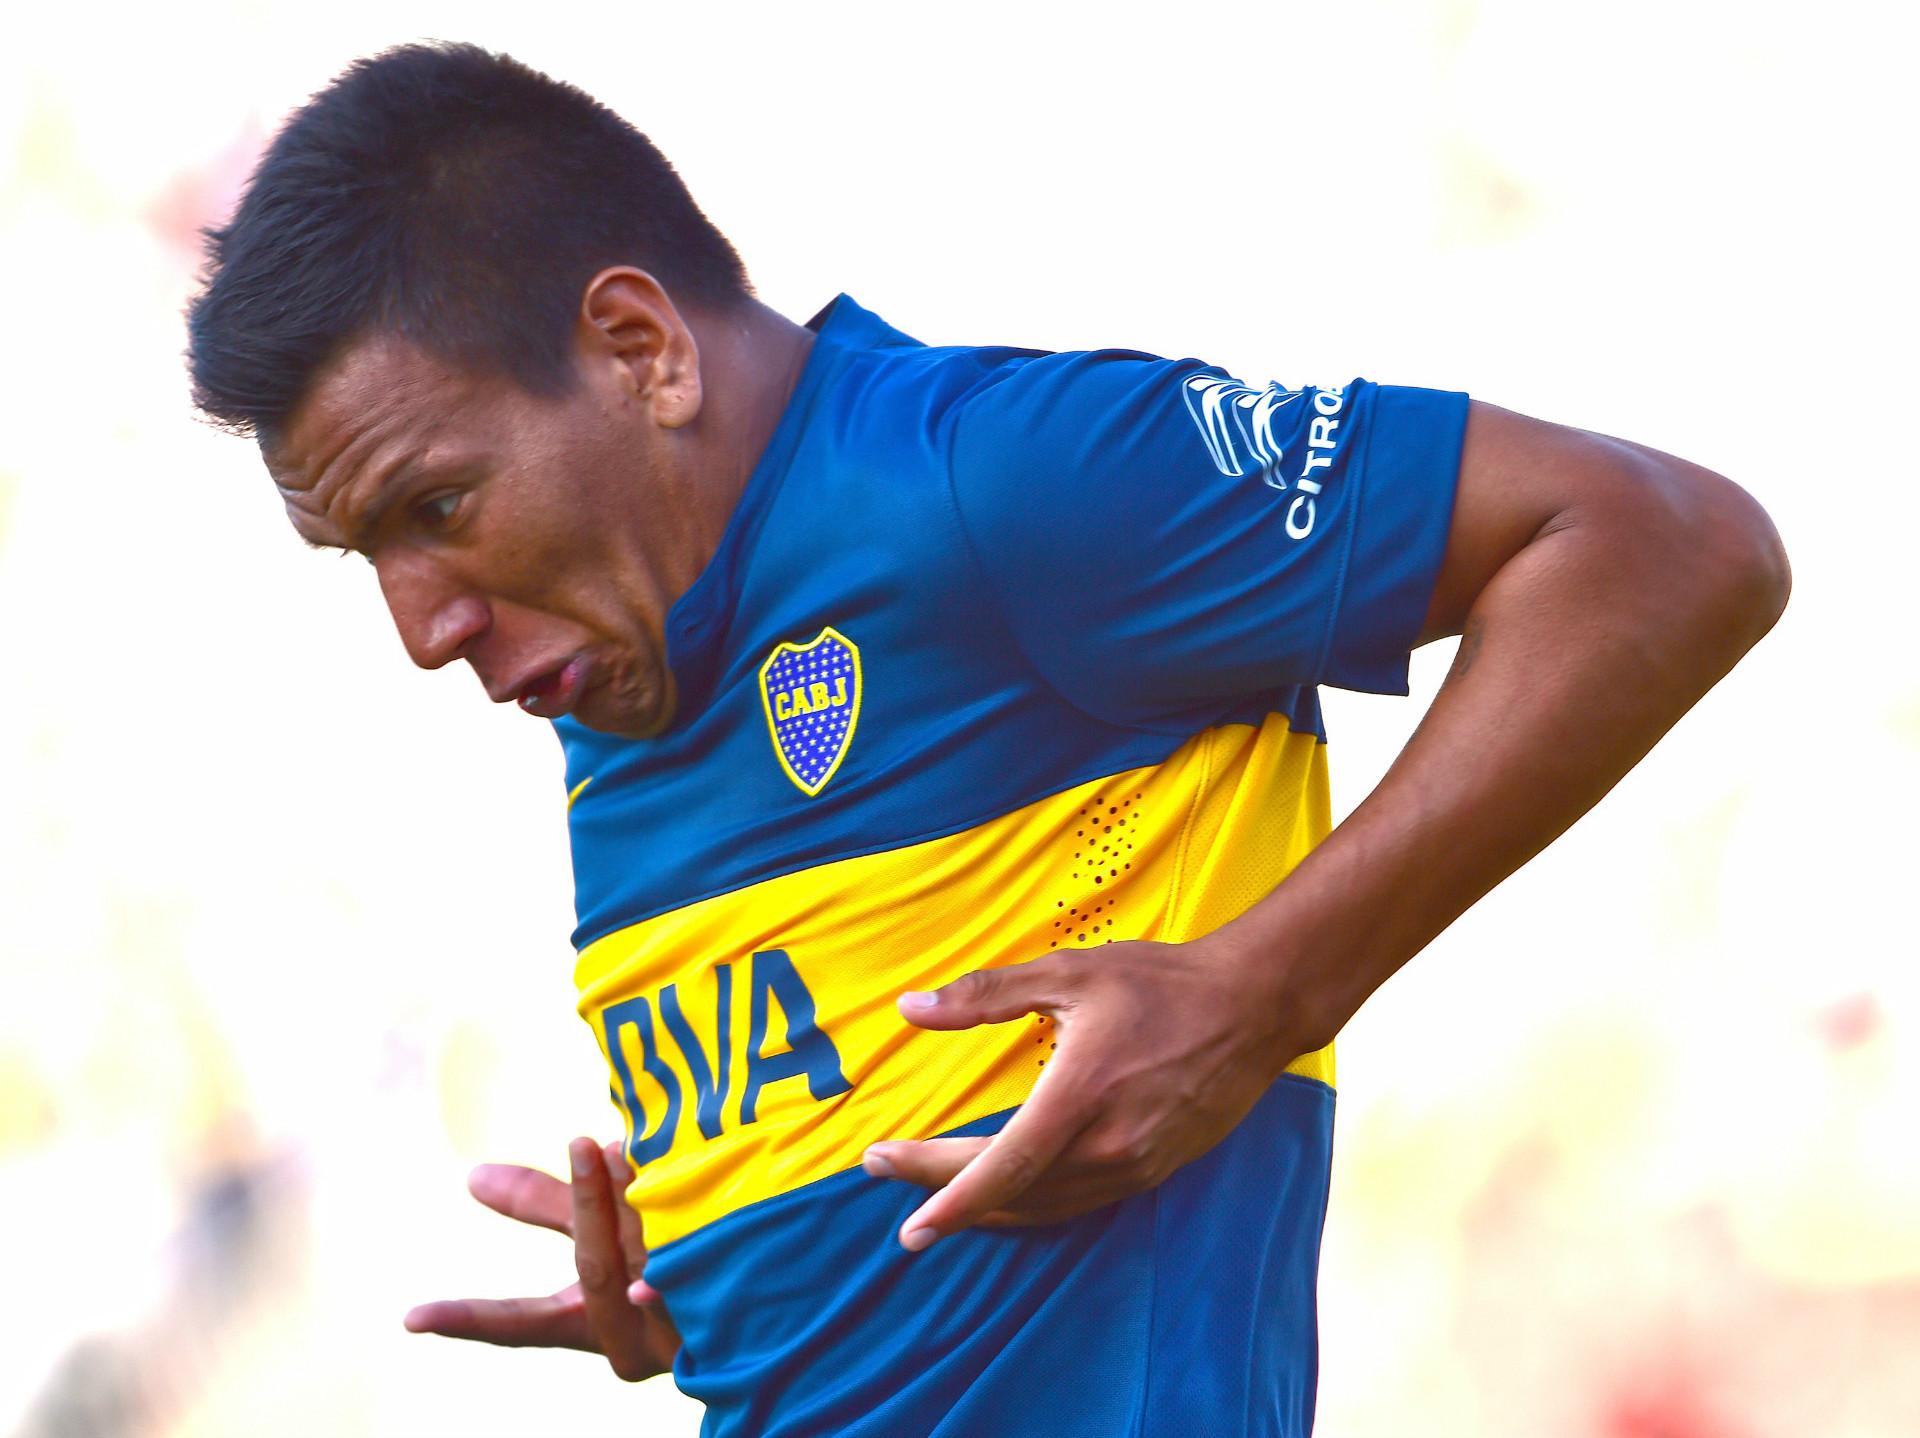 Andres Chavez Palestino Boca Copa Libertadores 2015 18022015